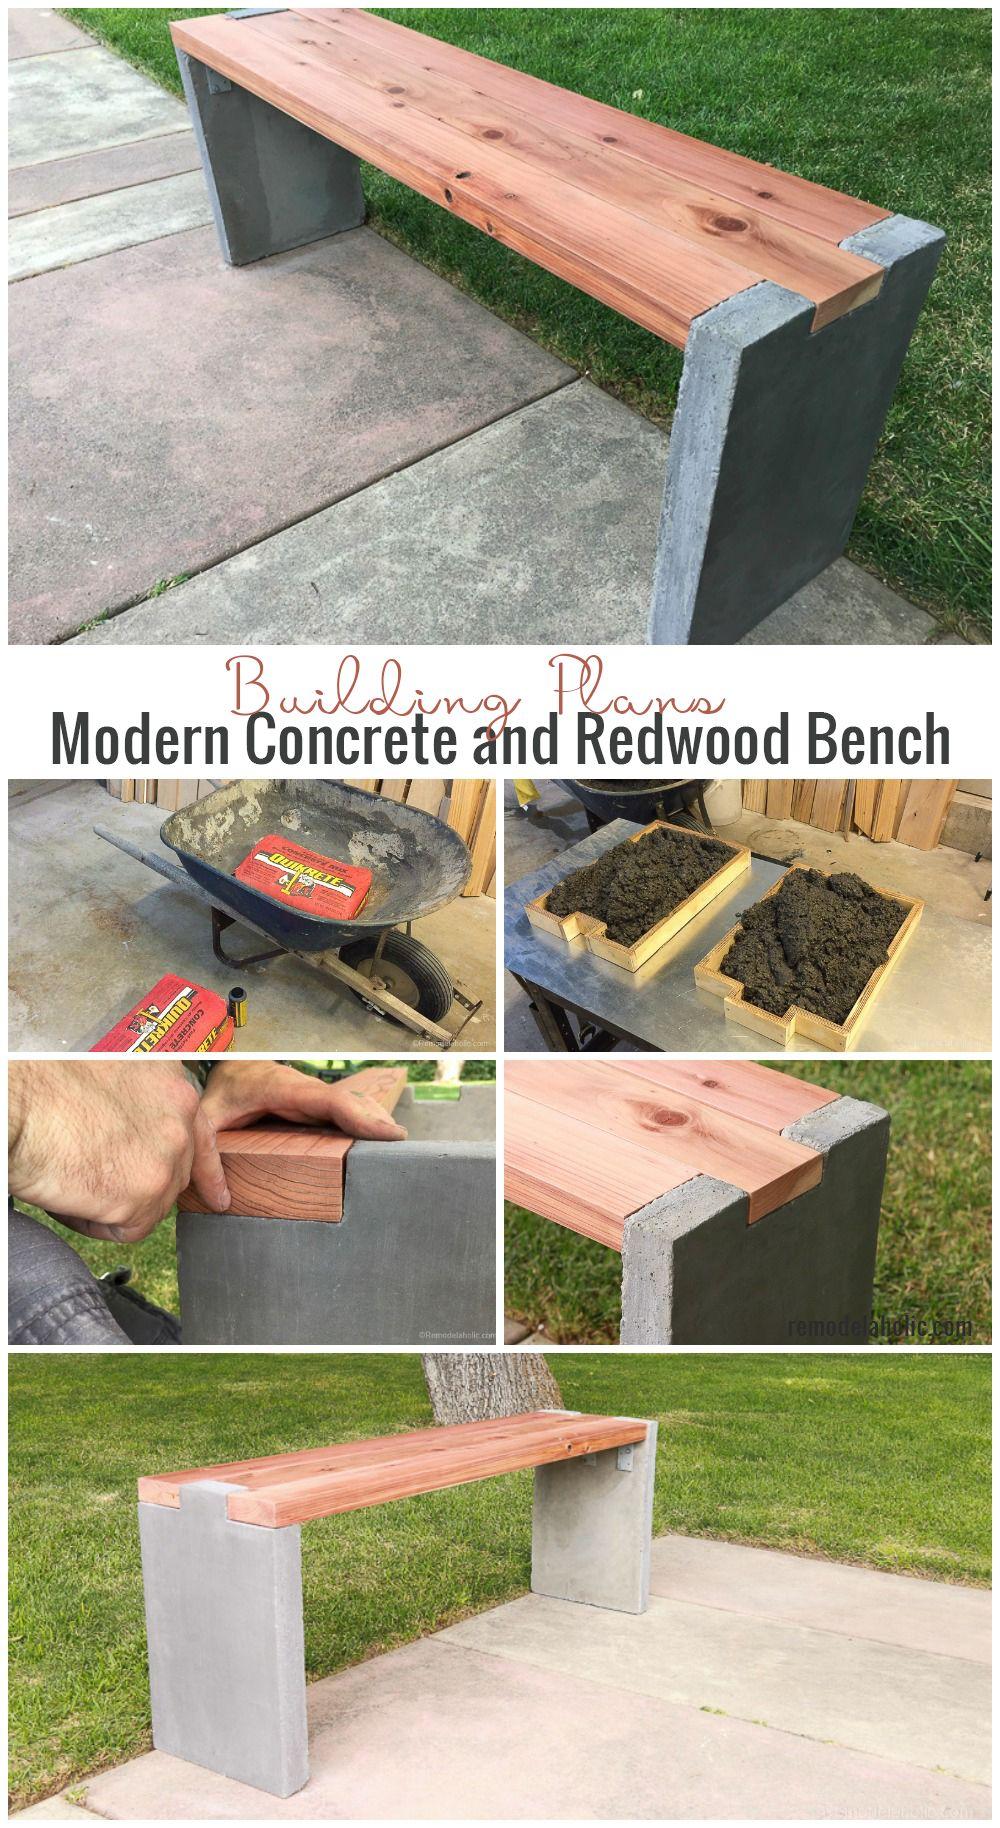 Concrete Bench Ideas Part - 26: Modern Concrete And Redwood Bench. Build This Beautiful Modren Concrete  Bench Full Plans Available.